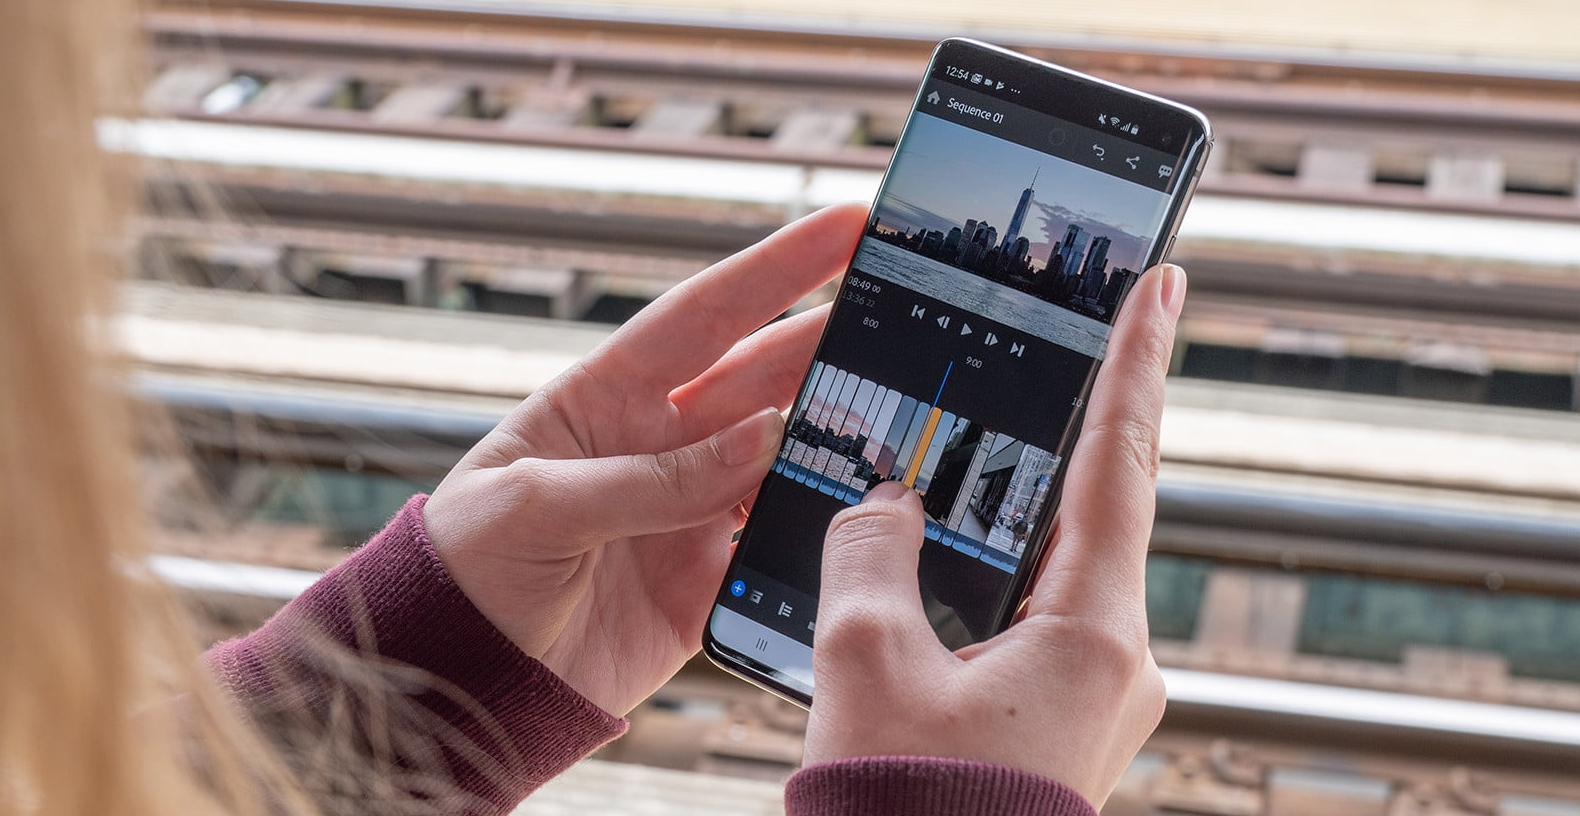 Android 版的 Premiere 影片剪輯 app 登場,內建簡單色彩調整、雜音消除、客製化動態圖樣